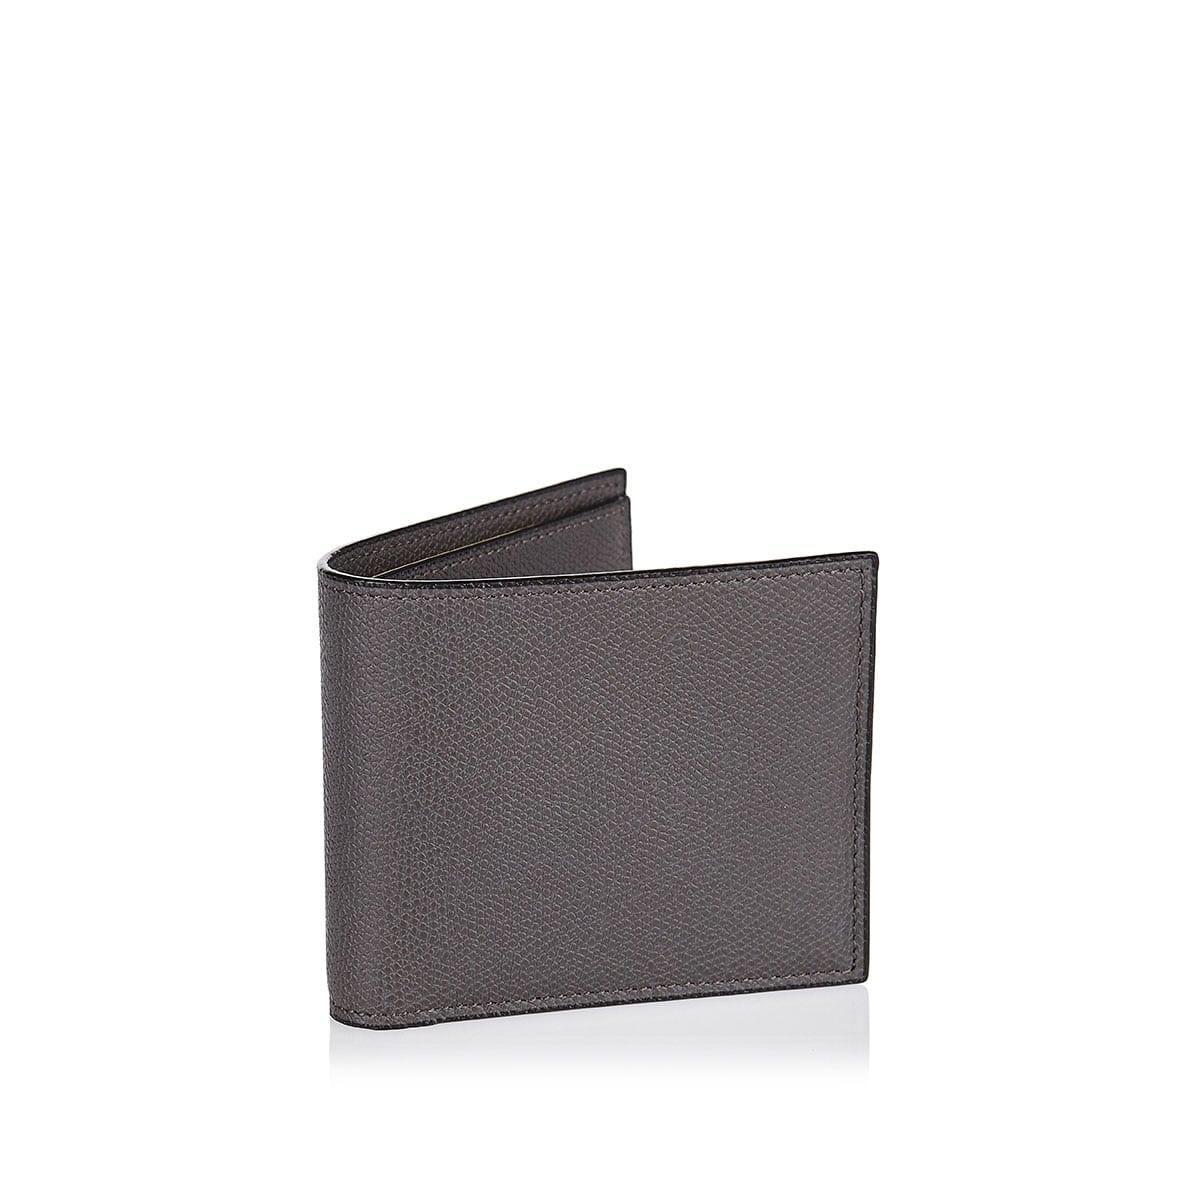 6CC bi-fold leather wallet